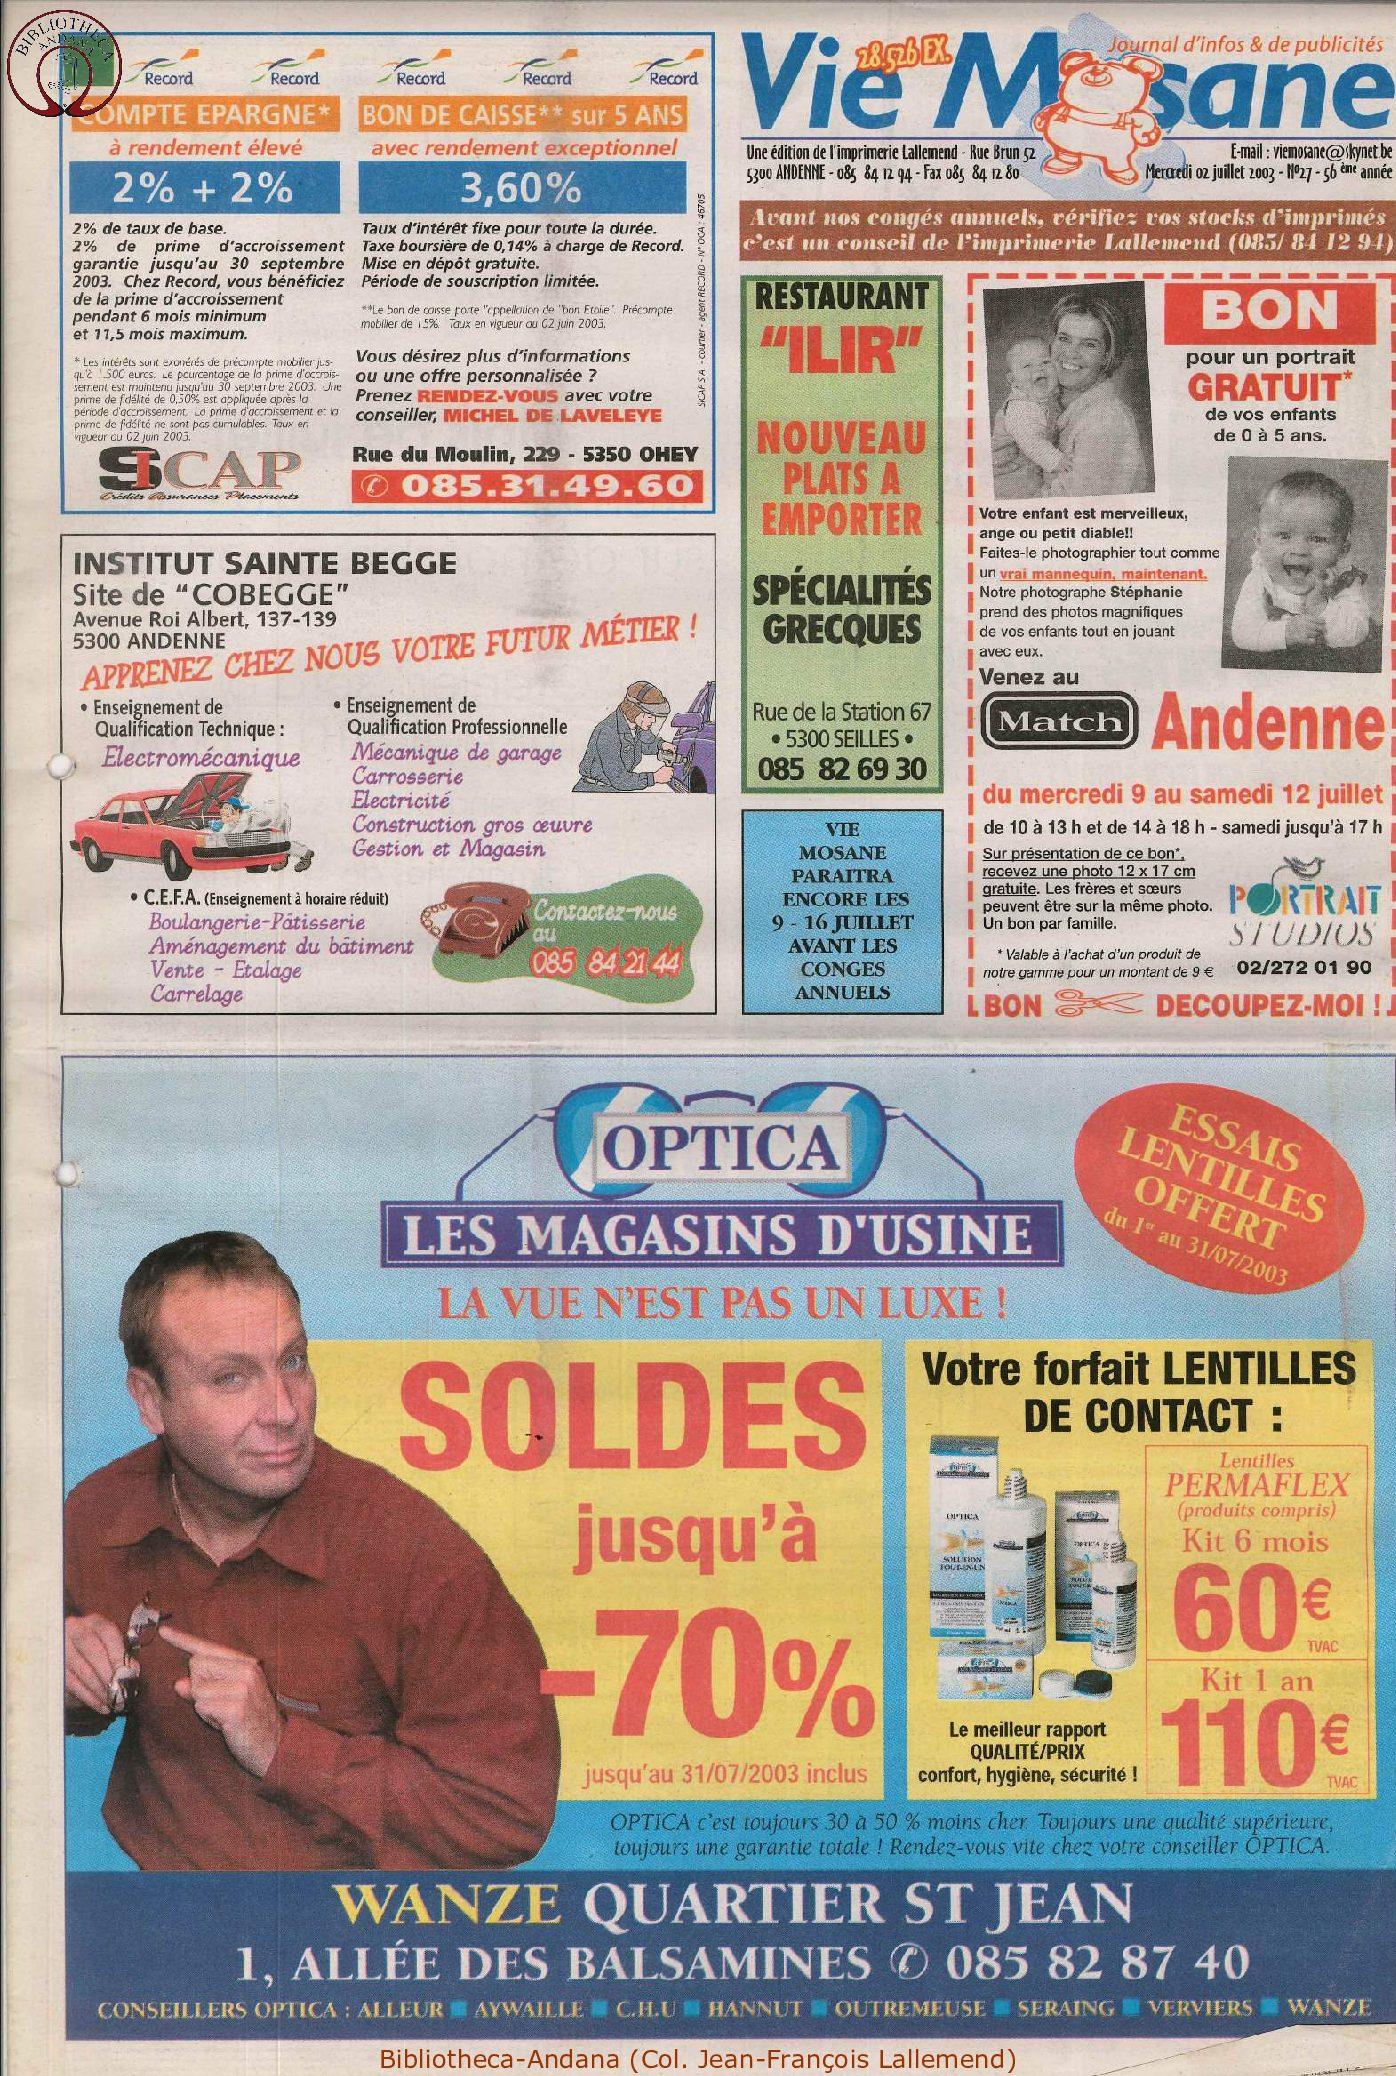 57e année - n°27 - 2 juillet 2003